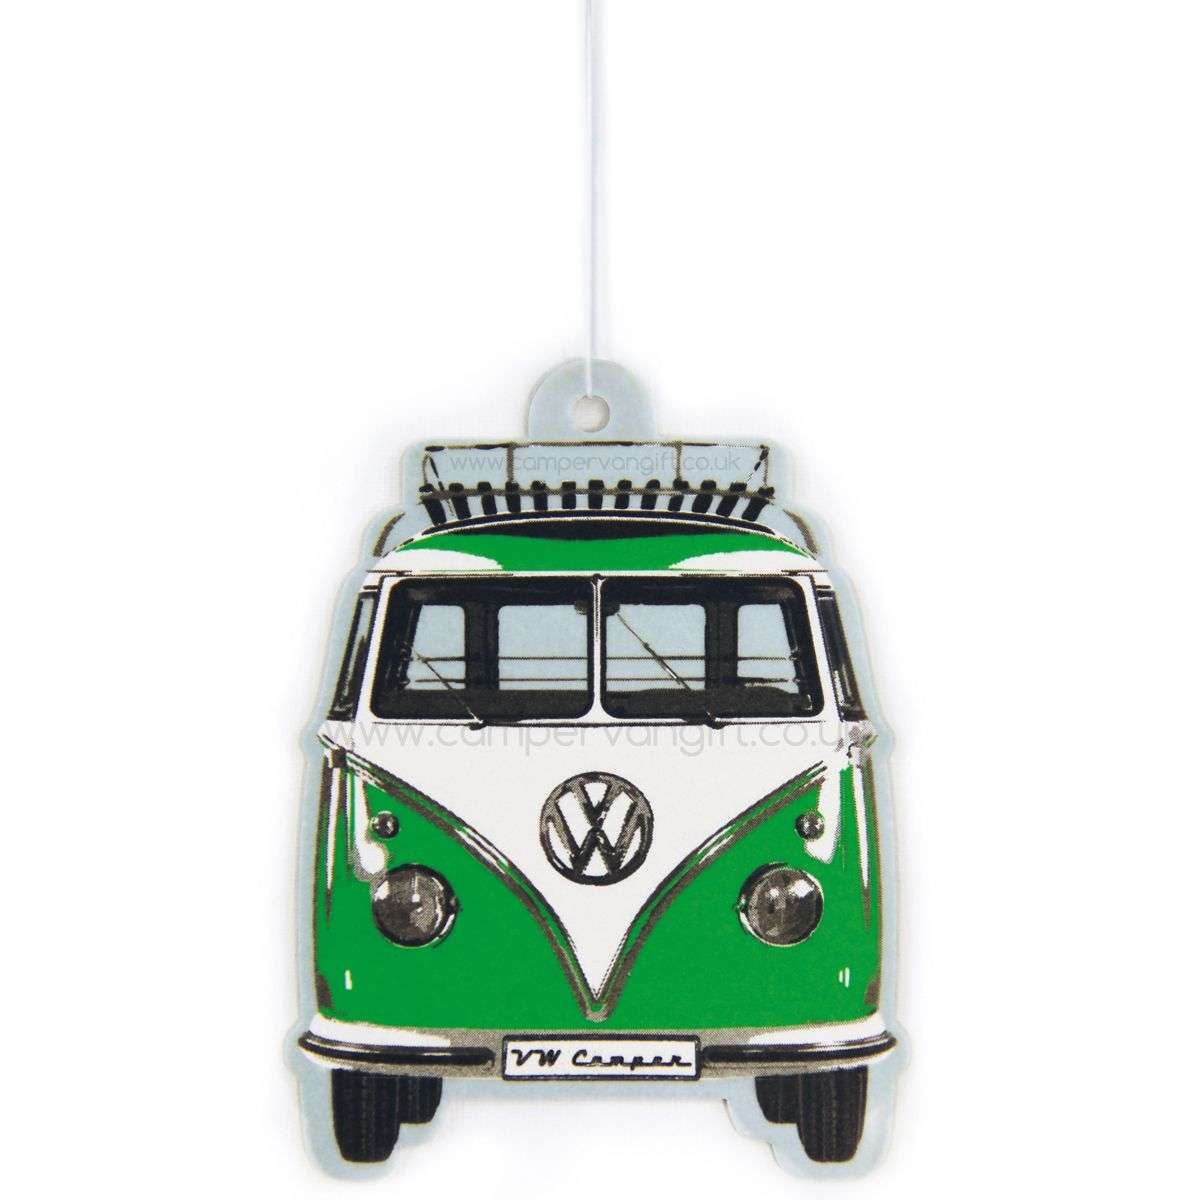 Campervan Gift - VW Campervan Air Freshener - Green Apple, £2.95 (http://www.campervangift.co.uk/vw-campervan-air-freshener-green-apple/)